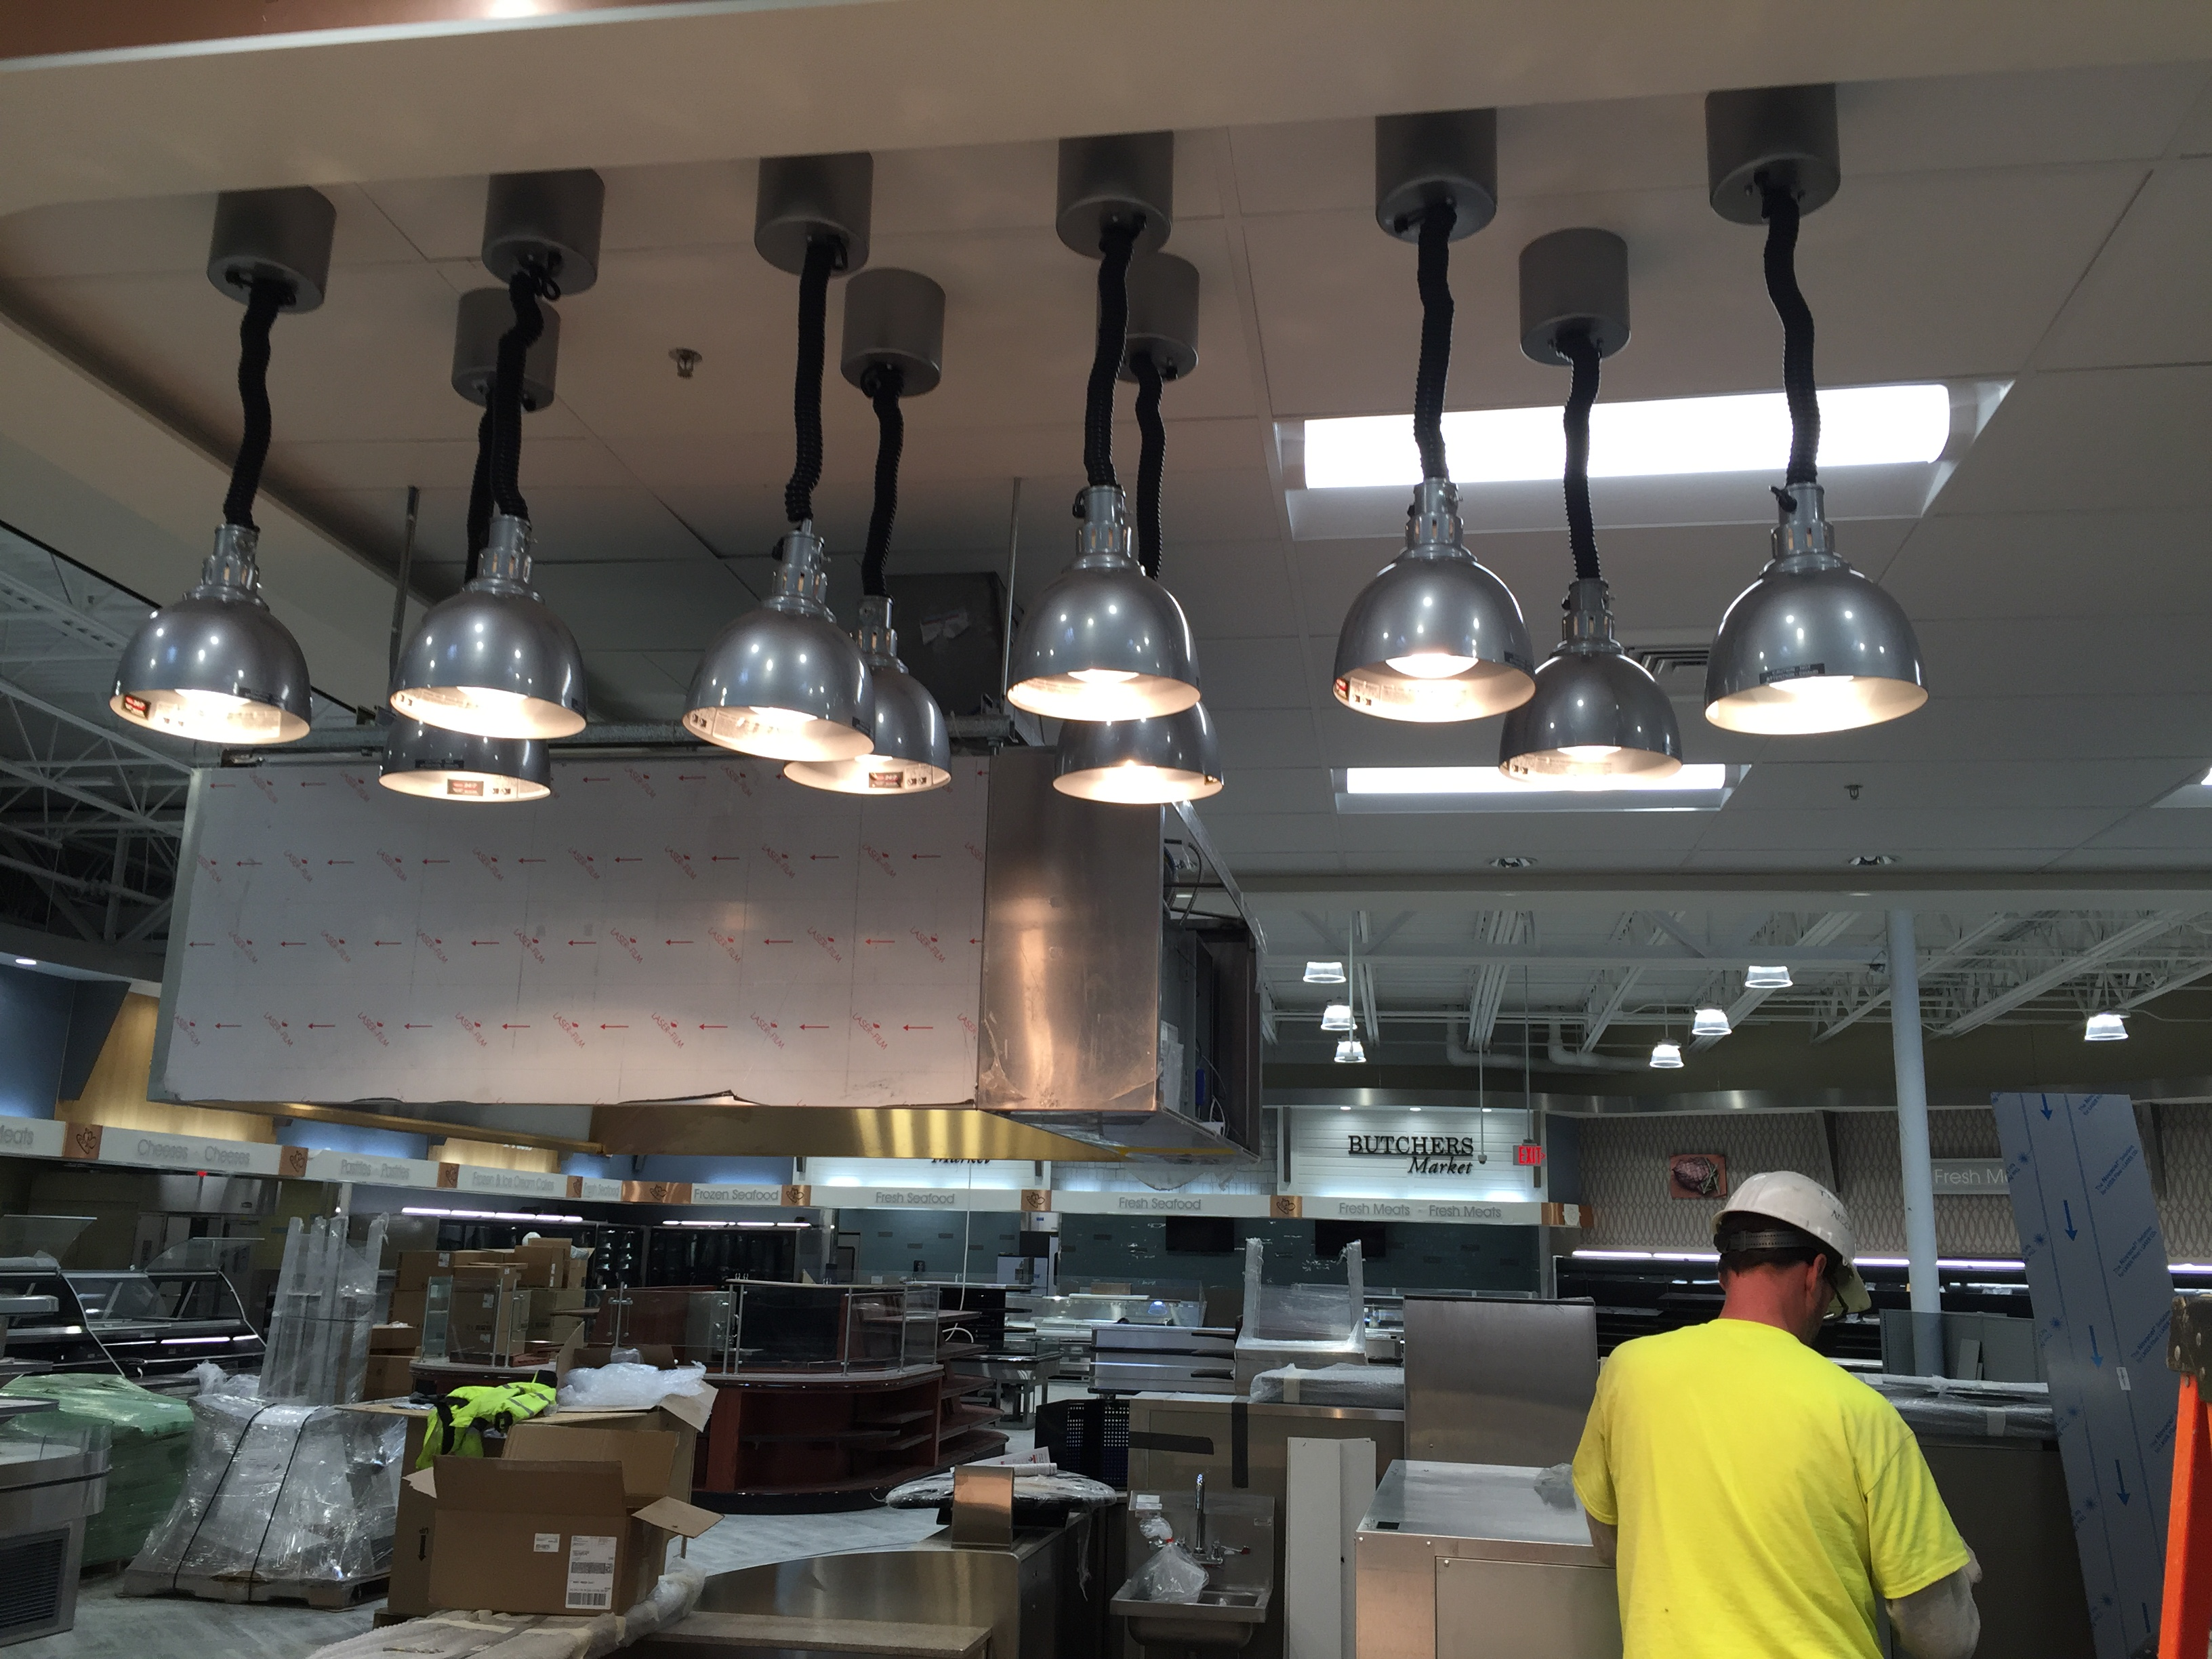 Grocery Store_Food Prep